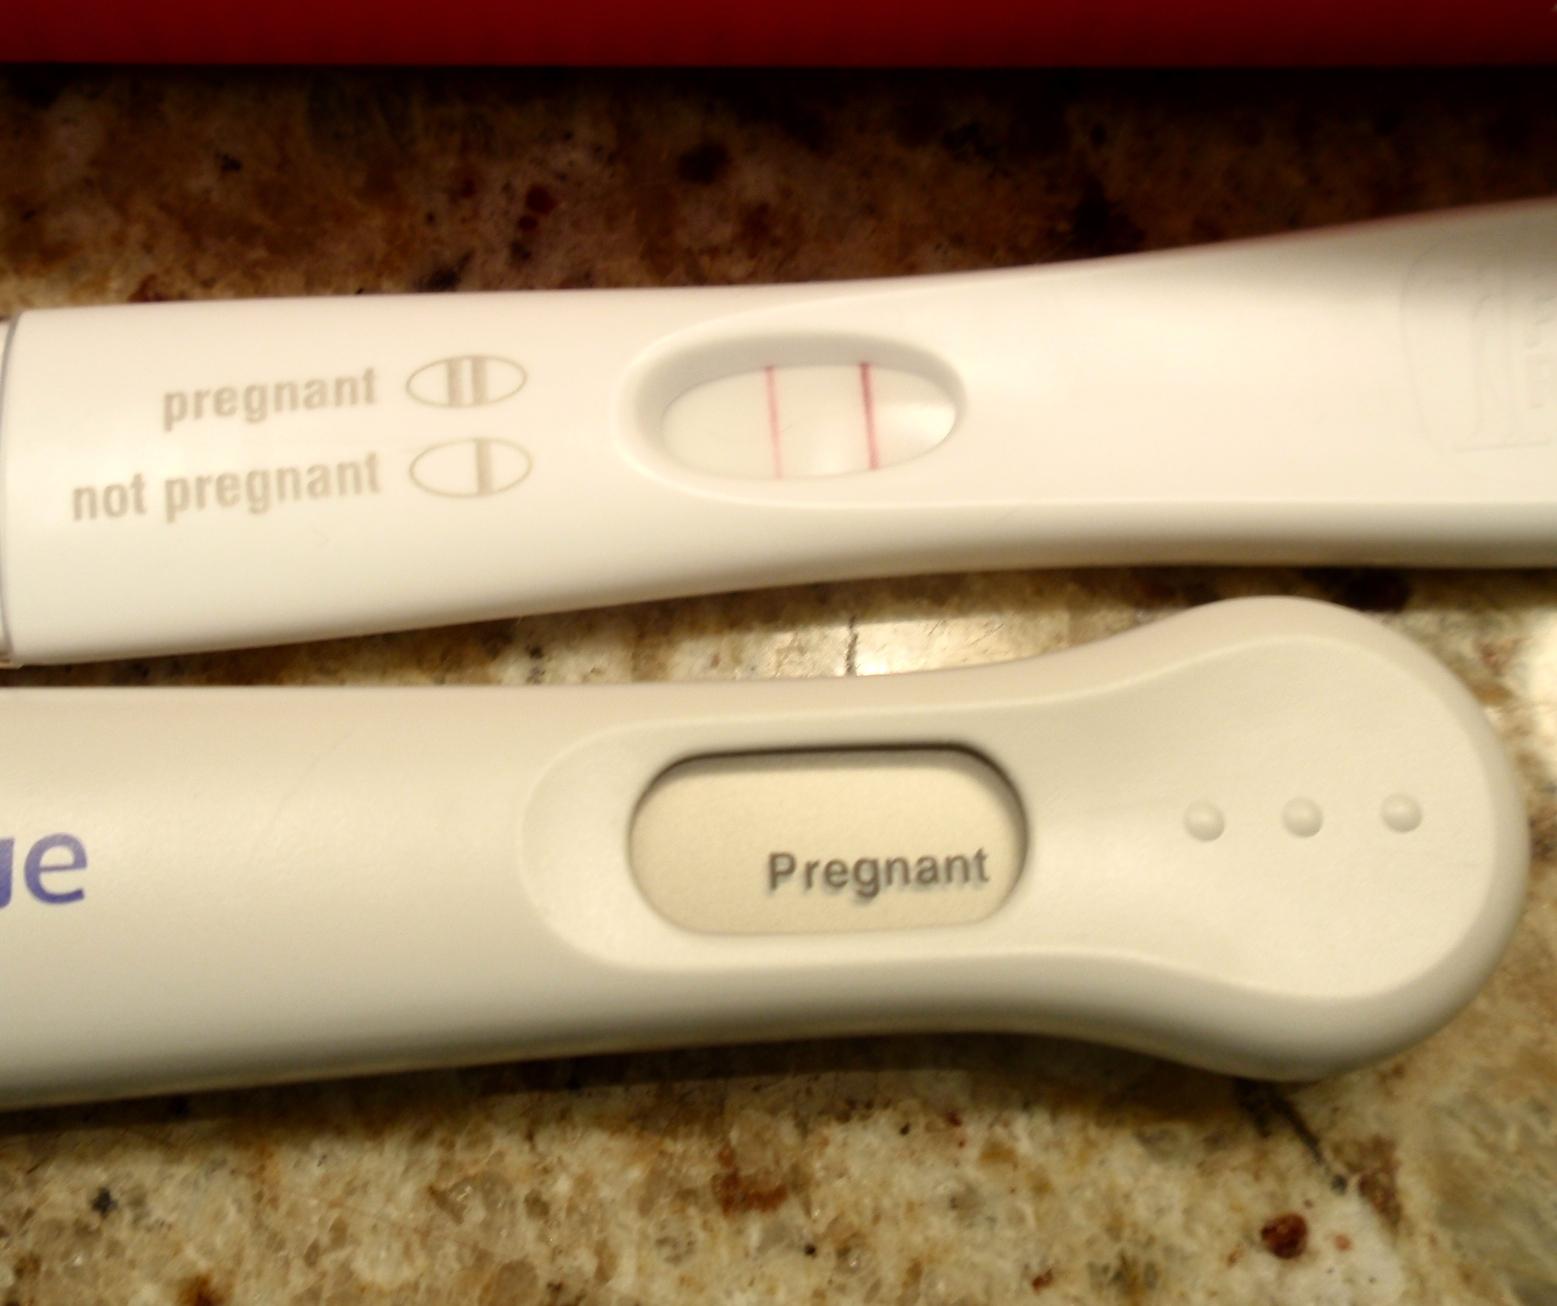 Funny Pregnancy Test Meme : Pregnancy test meme memes